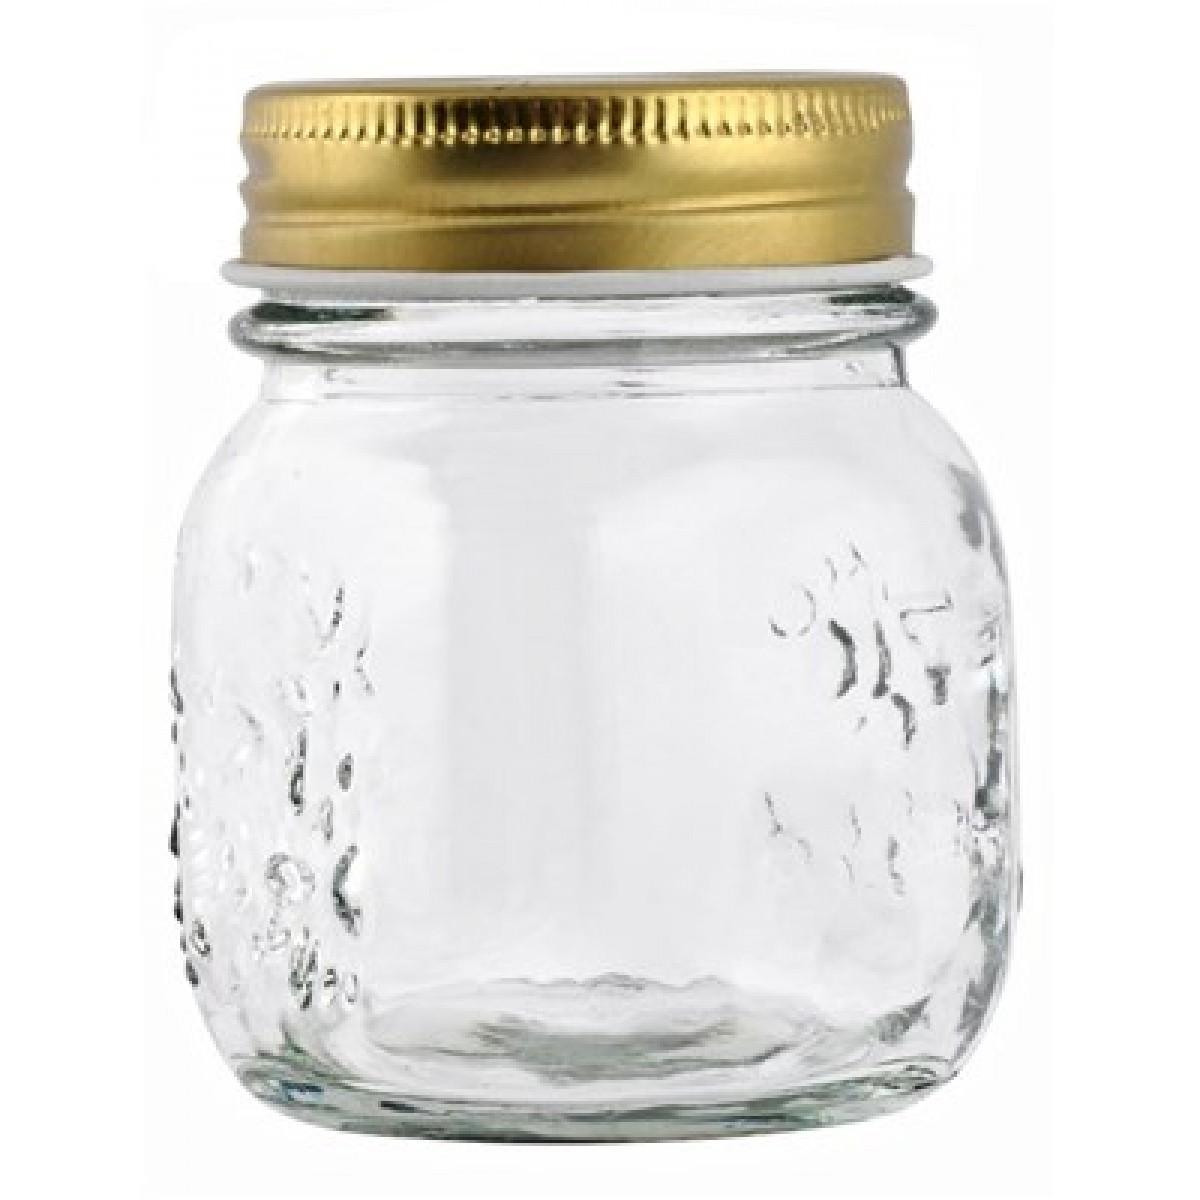 DAY Sylteglas 150 ml m/skruelåg